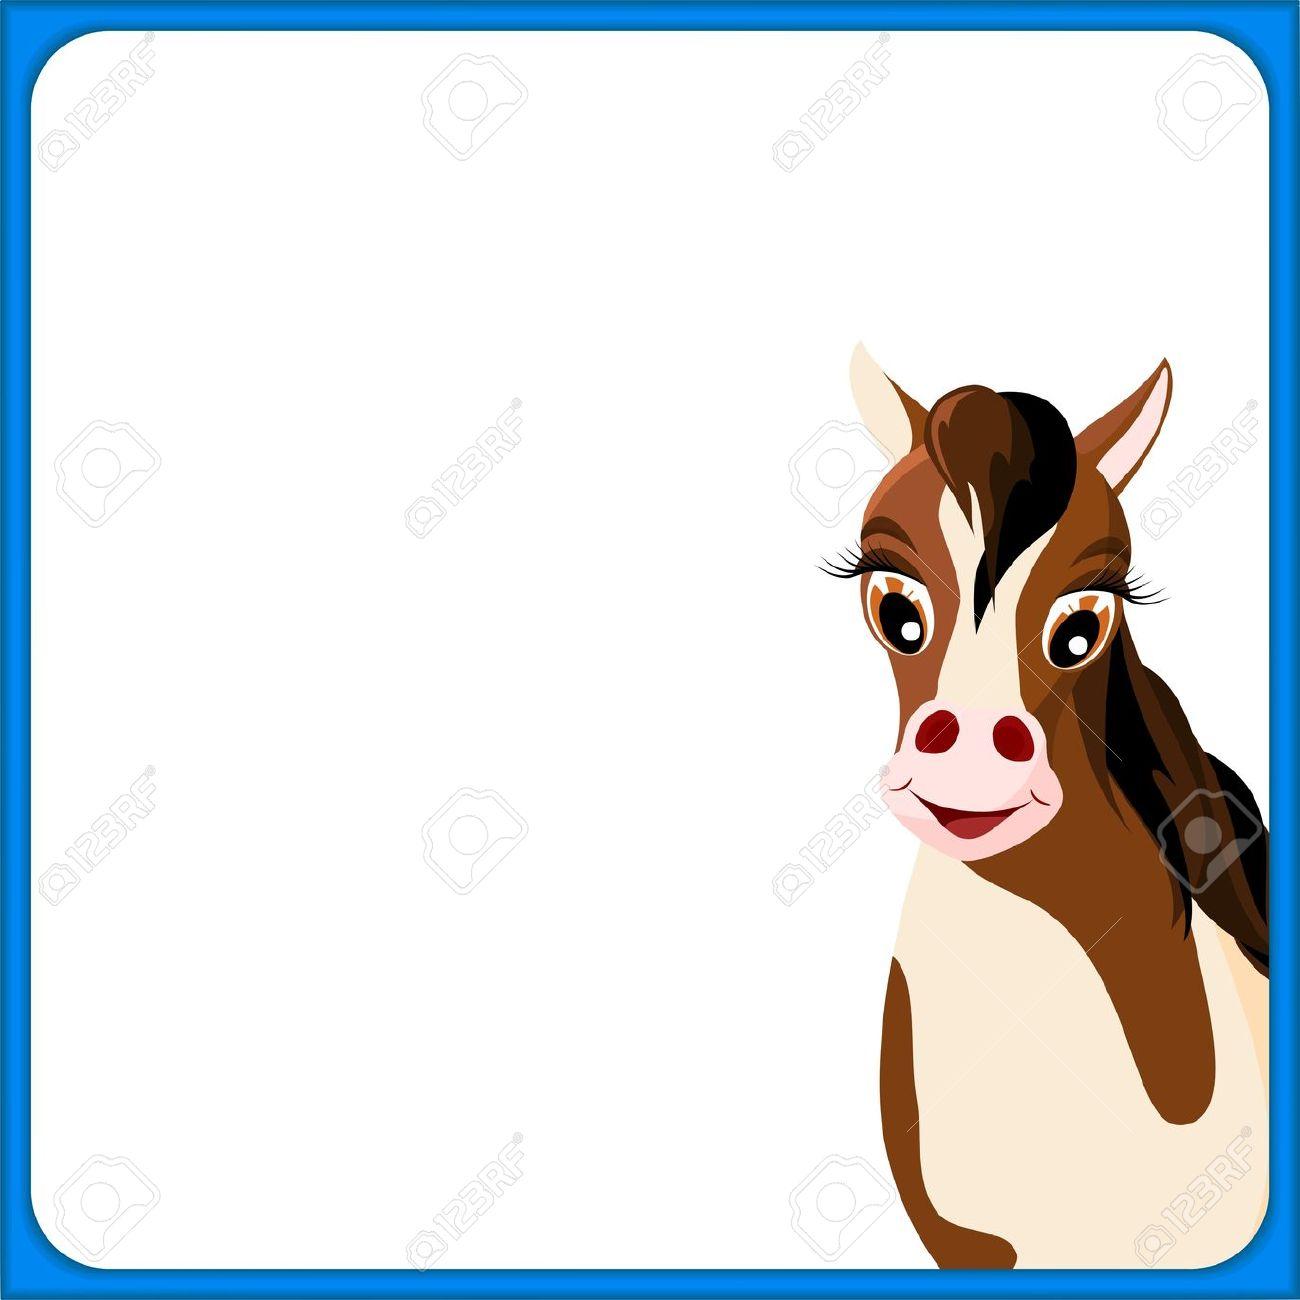 Horse clip art borders jpg royalty free stock Horse border clipart - ClipartFox jpg royalty free stock